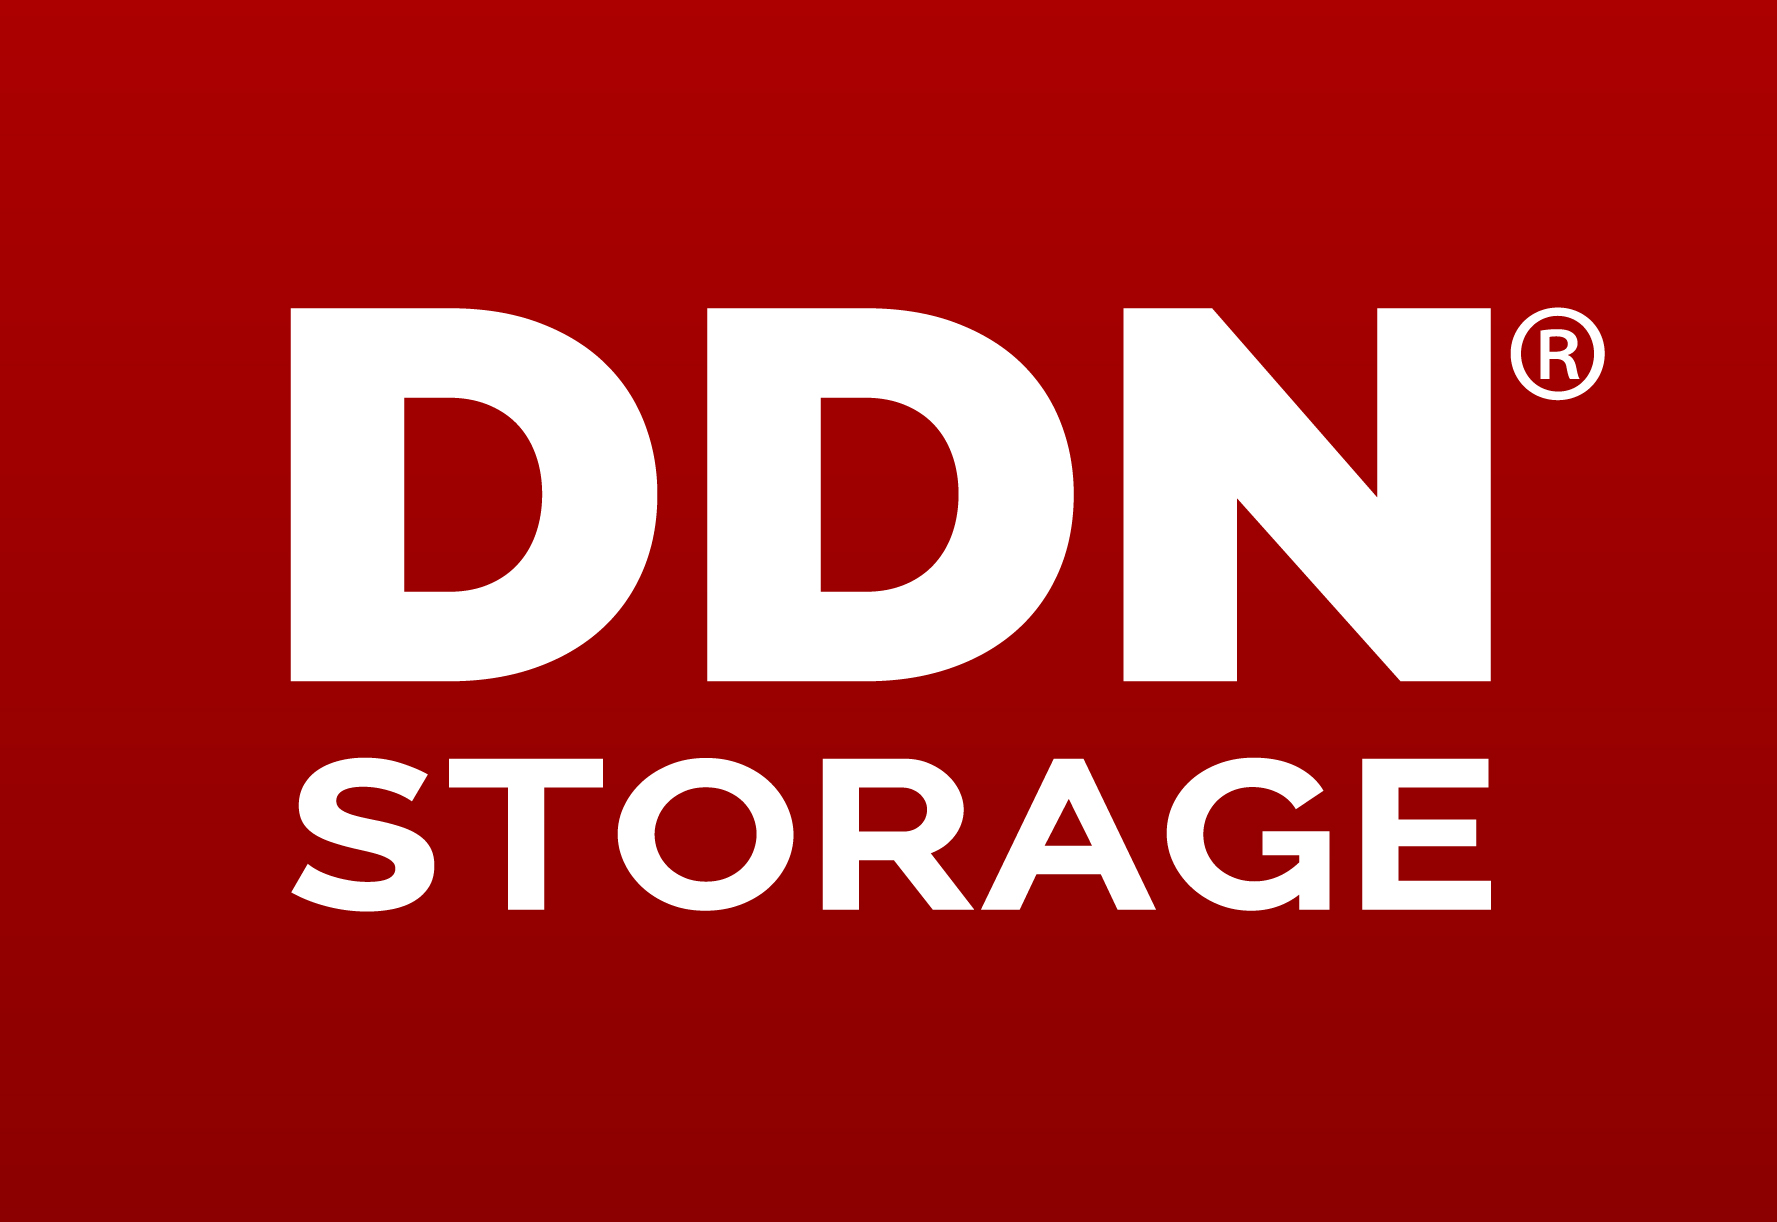 C3 Customer - Data Direct Networks